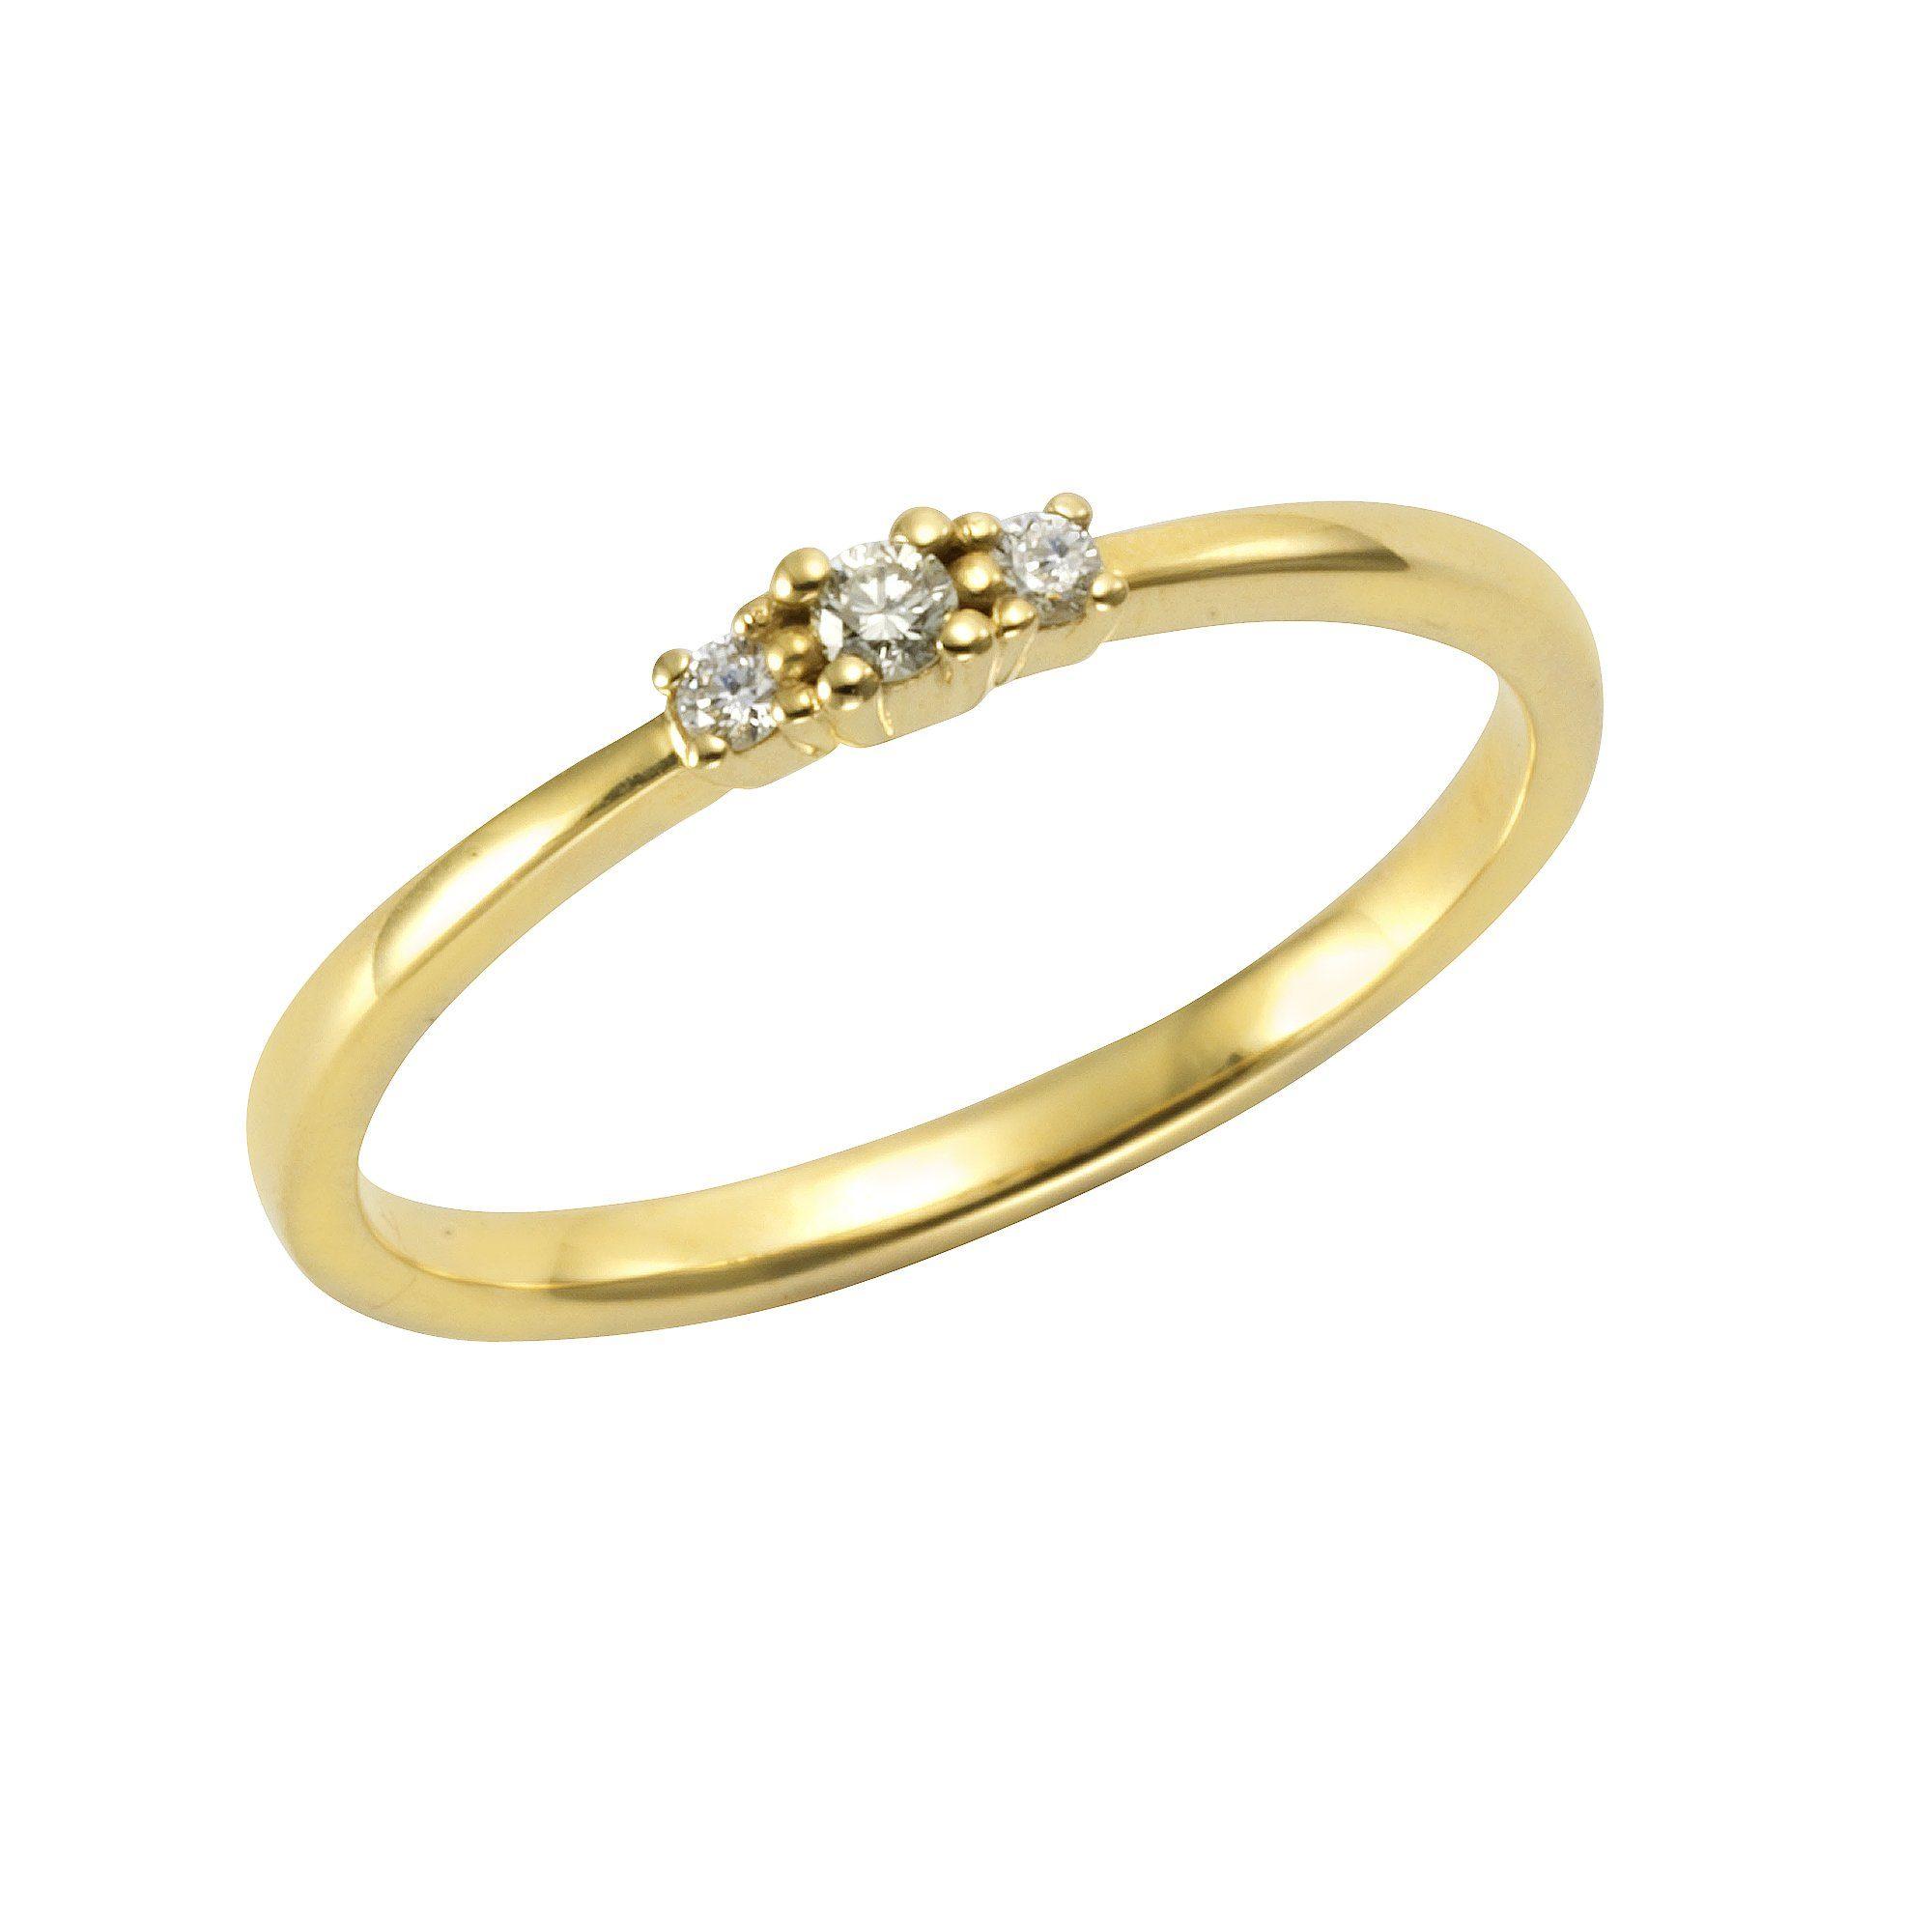 Orolino Ring 585/- Gelbgold Brillant | Schmuck > Ringe > Goldringe | Gelb | Orolino